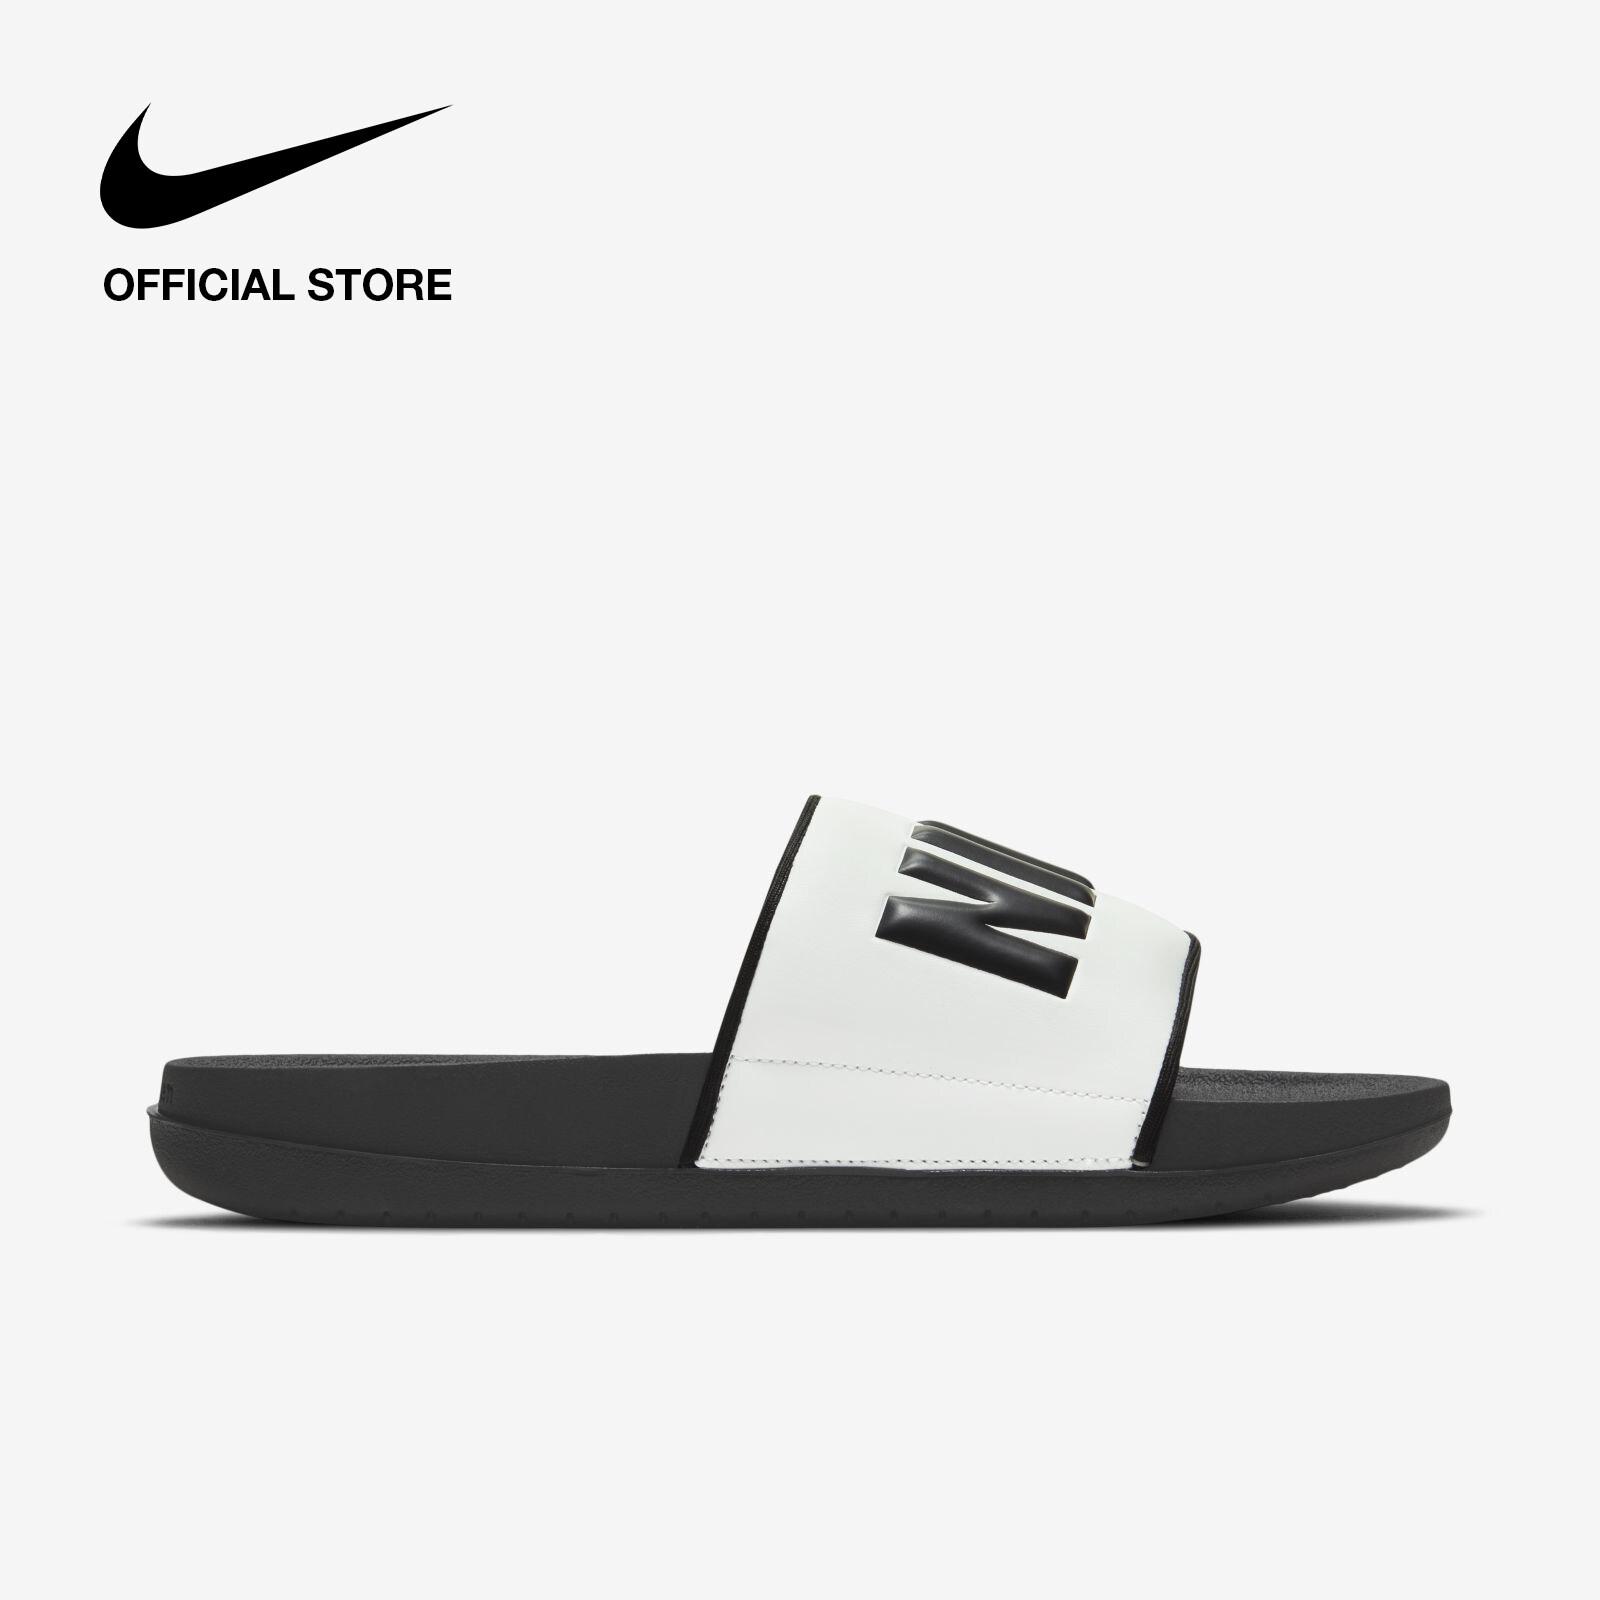 Nike Women's Offcourt Slide - Black ไนกี้ รองเท้าแตะผู้หญิง ออฟคอร์ท - สีดำ